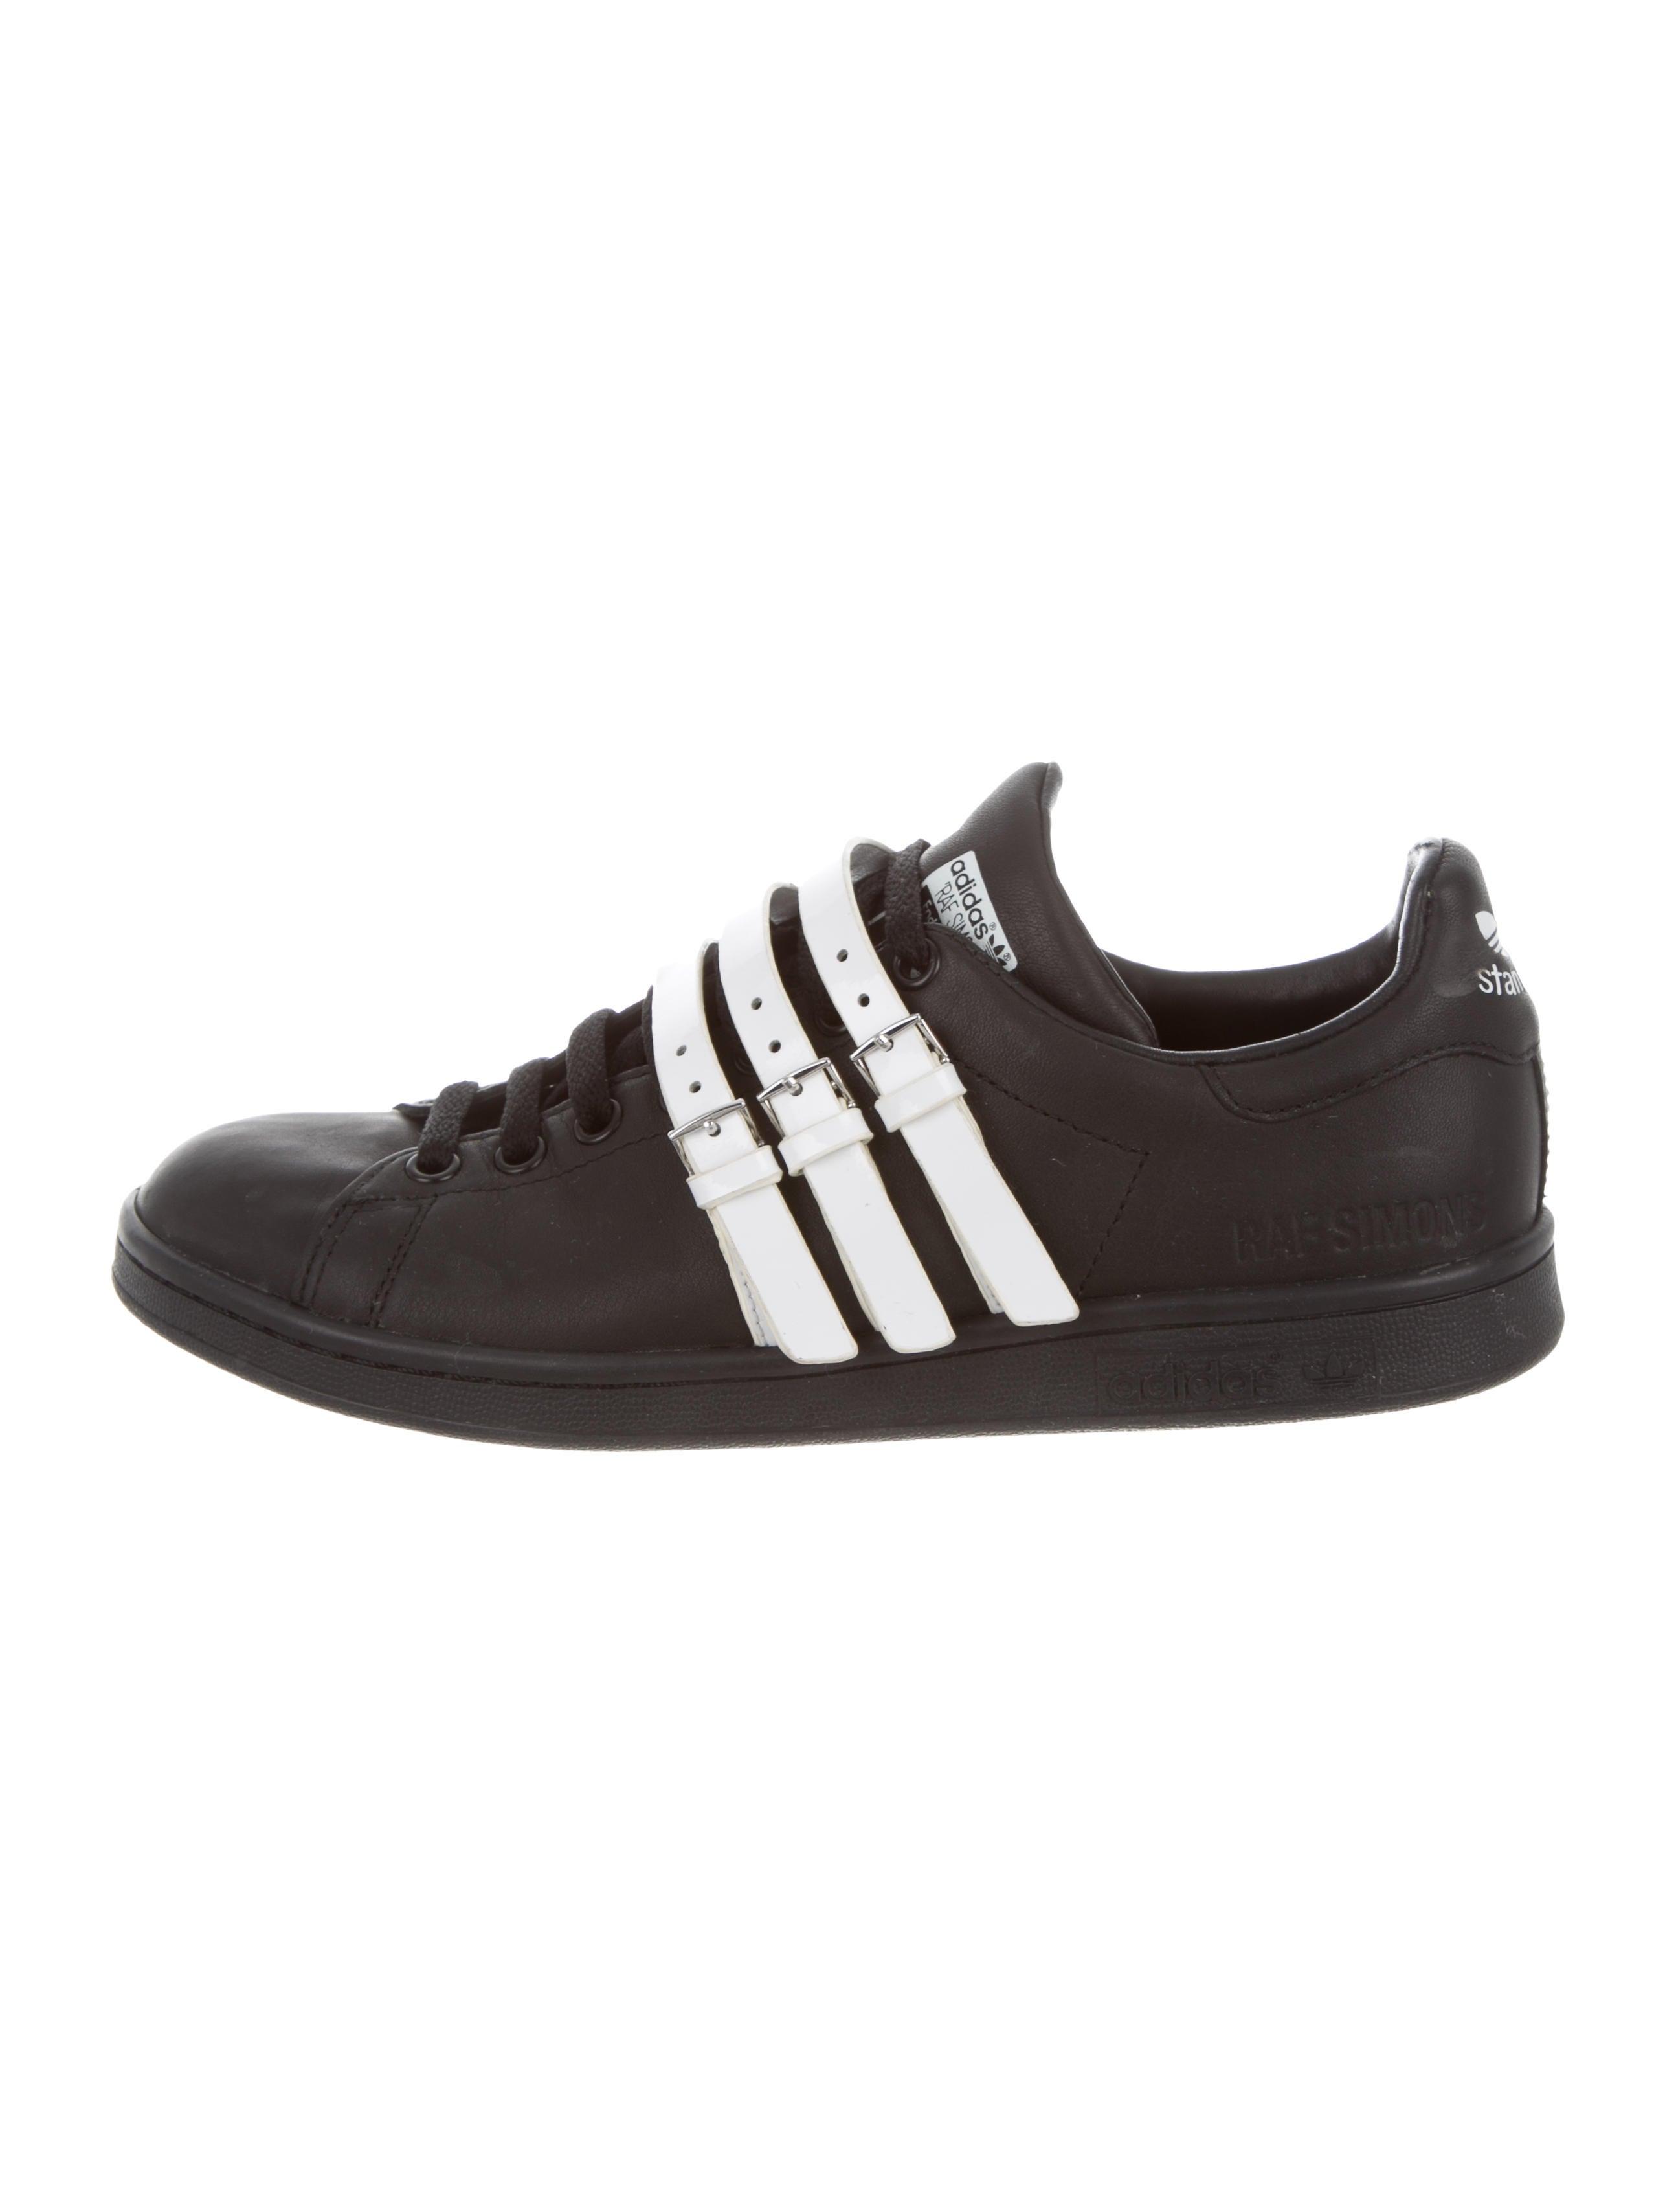 3f257e3143042 Raf Simons x adidas Raf Simons x Adidas Stan Smith Low-Top Sneakers ...